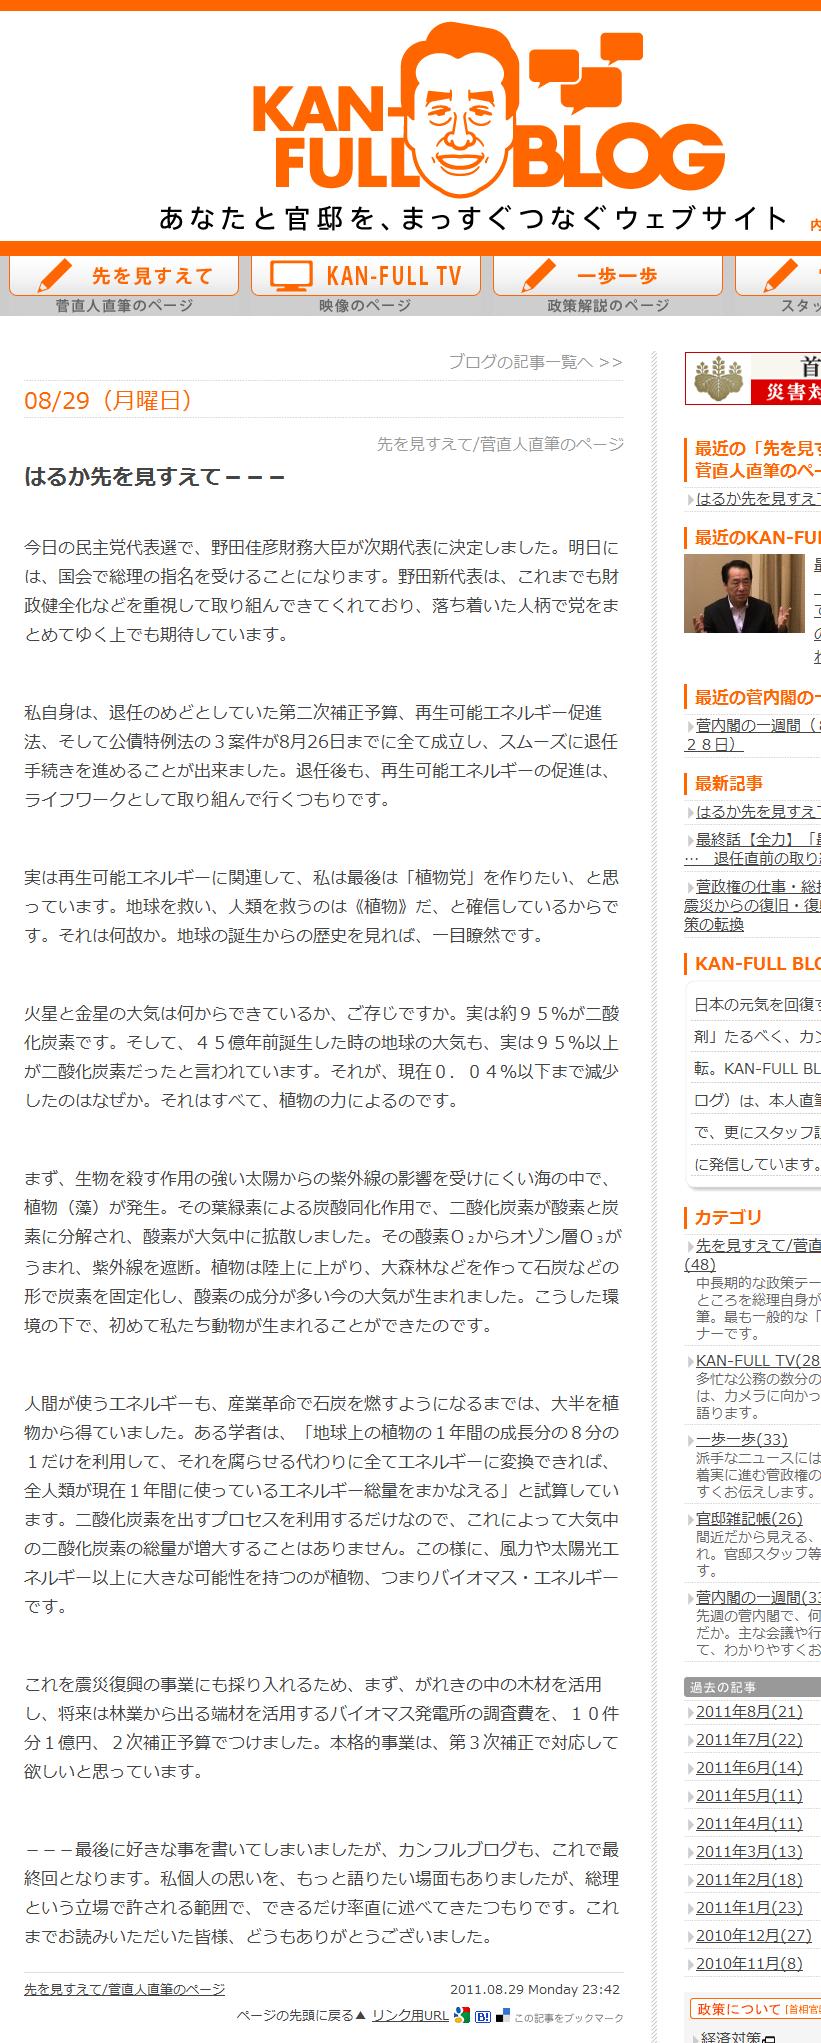 菅直人内閣総理大臣 - 首相官邸ブログ(KAN-FULL BLOG)